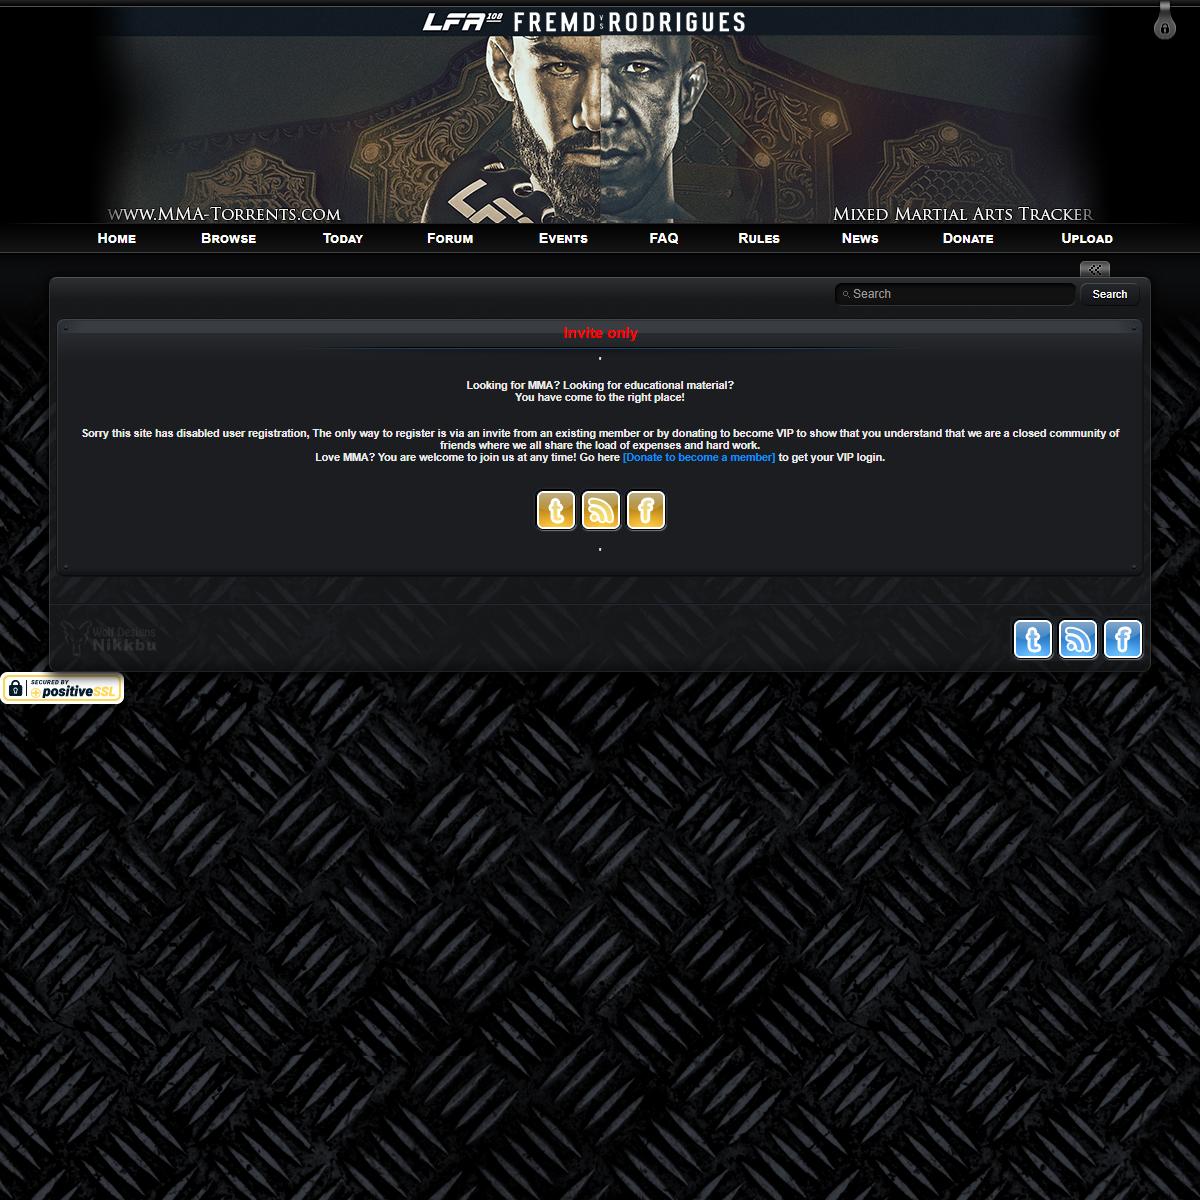 MMA-Torrents.com - Mixed Martial Arts Tracker - Invite only